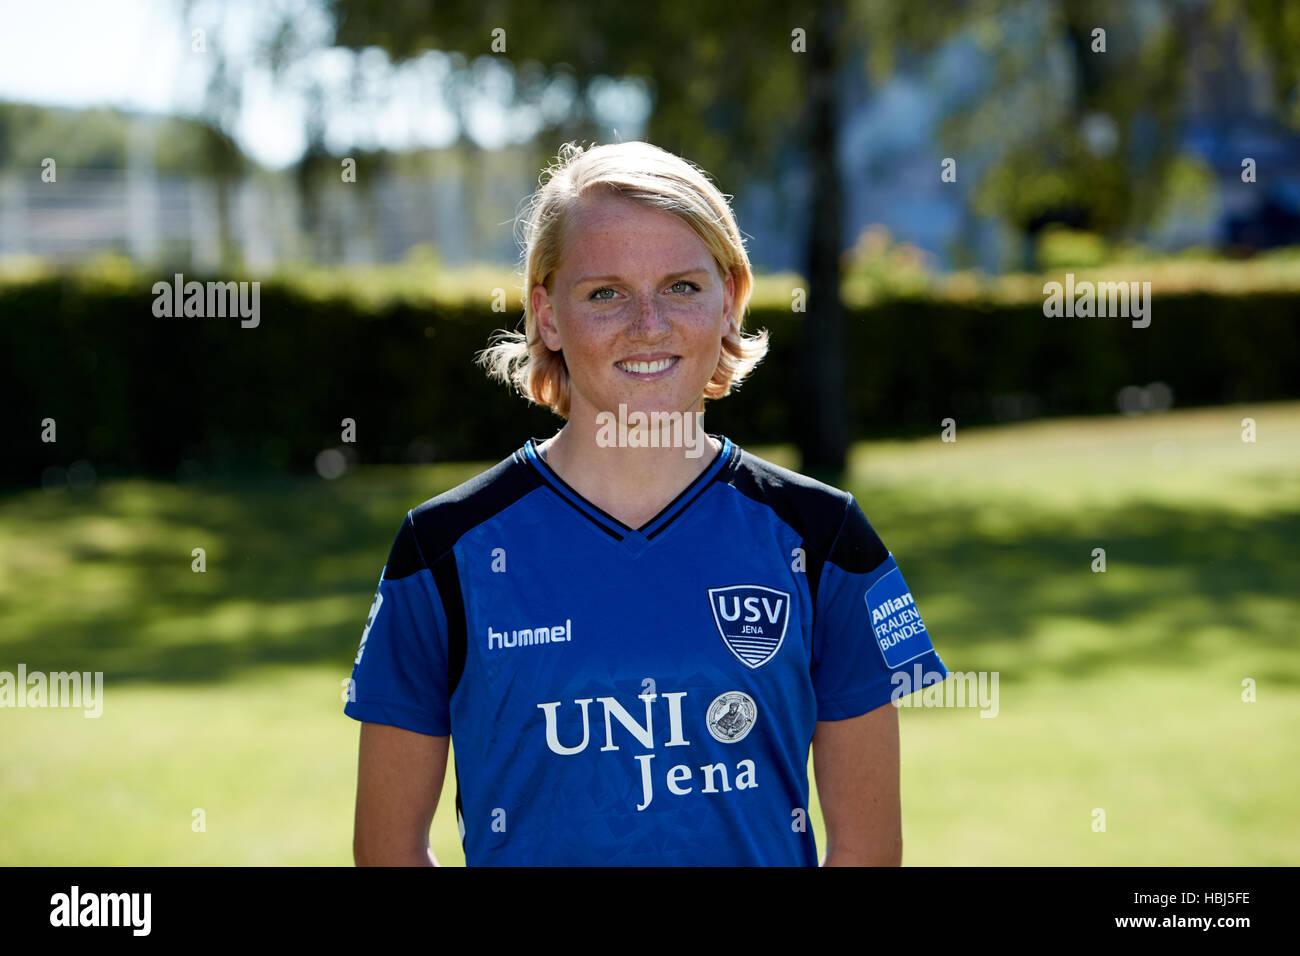 Marie-Luise Herrmann - Stock Image